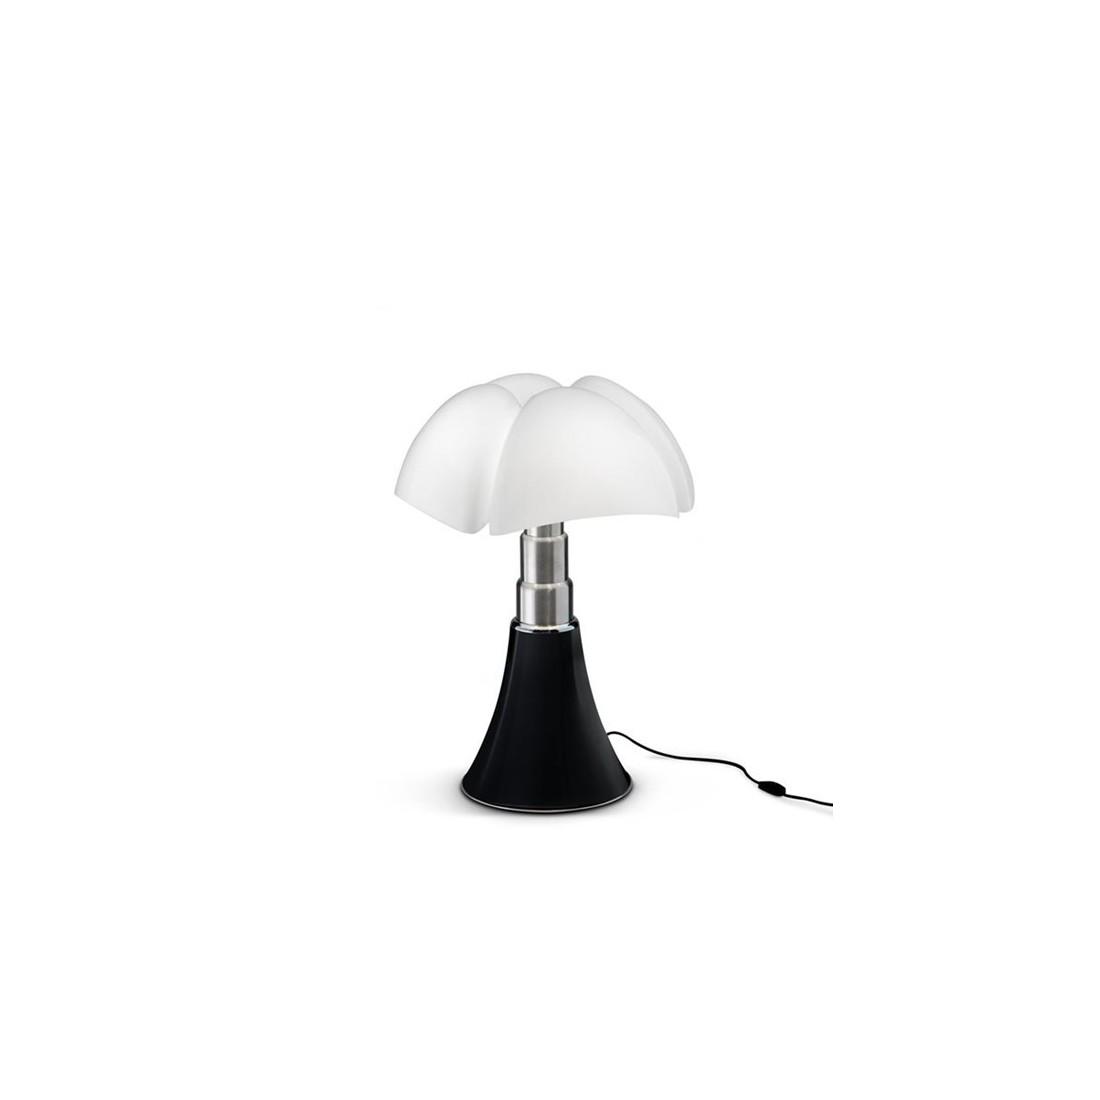 Grande lampe t lescopique pipistrello noir mat martinelli luce h66 86cm - Lampe pipistrello originale ...